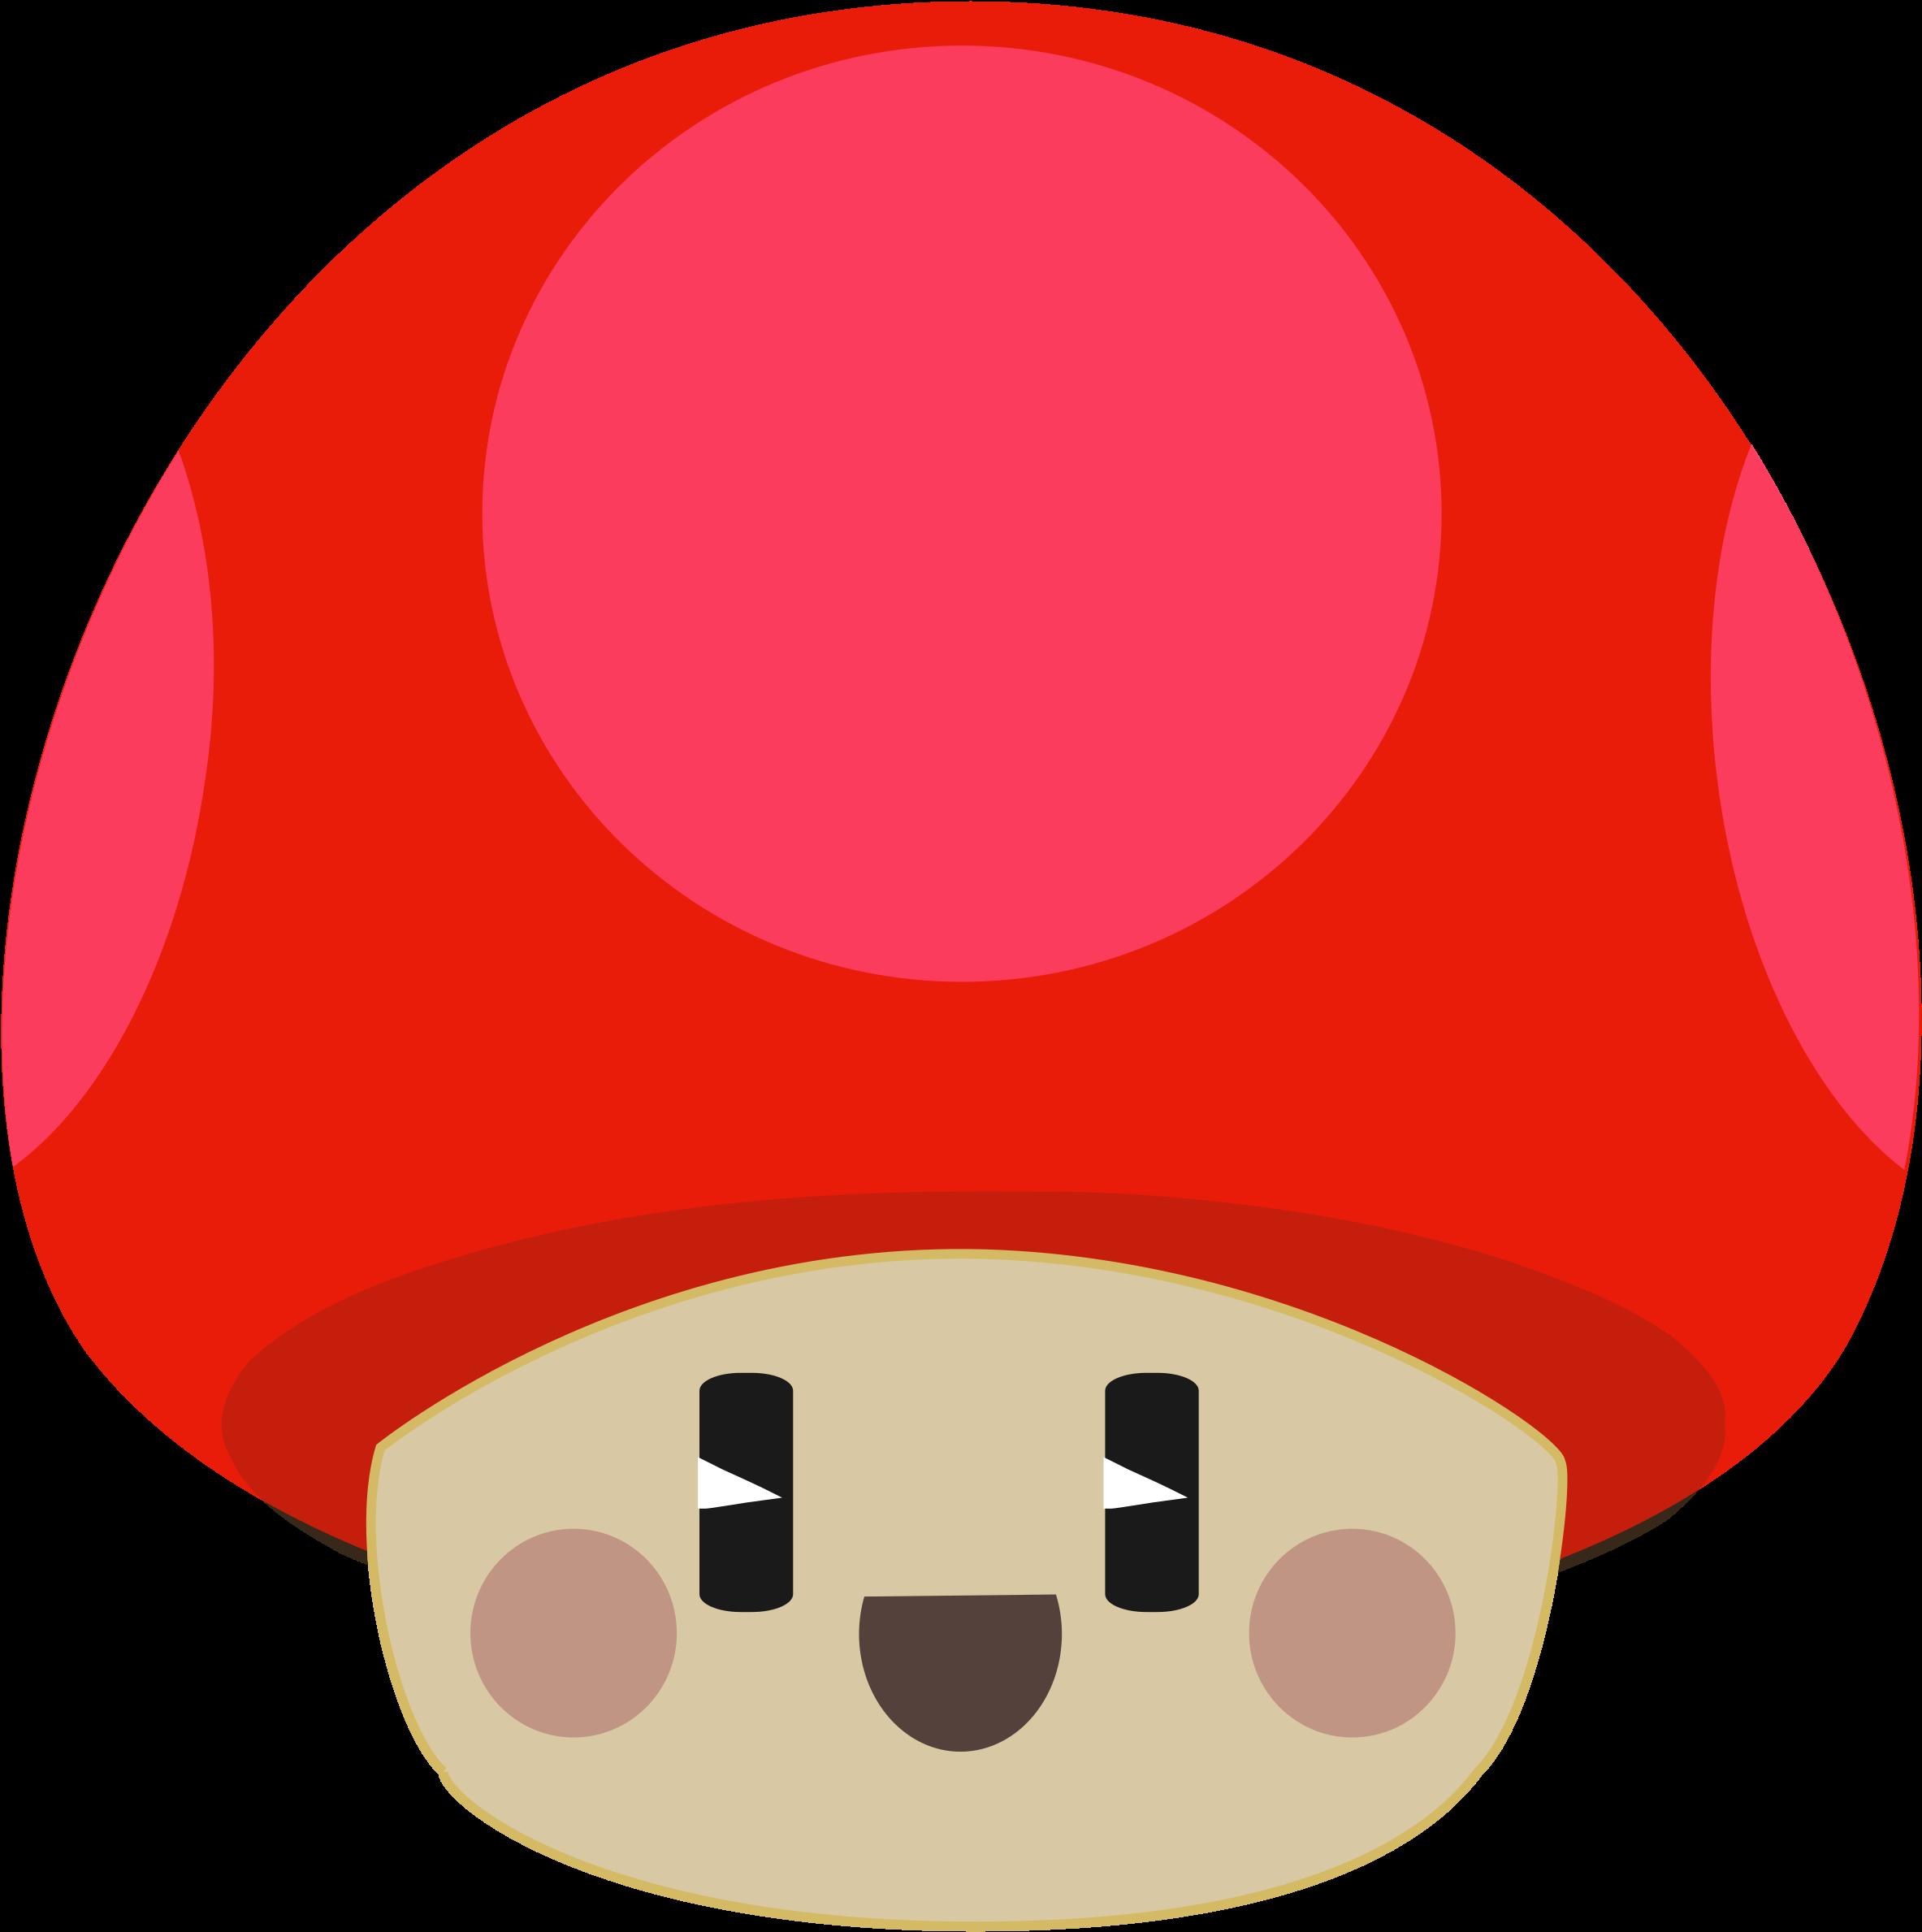 Mushrooms clipart cartoon. Animated congratulations